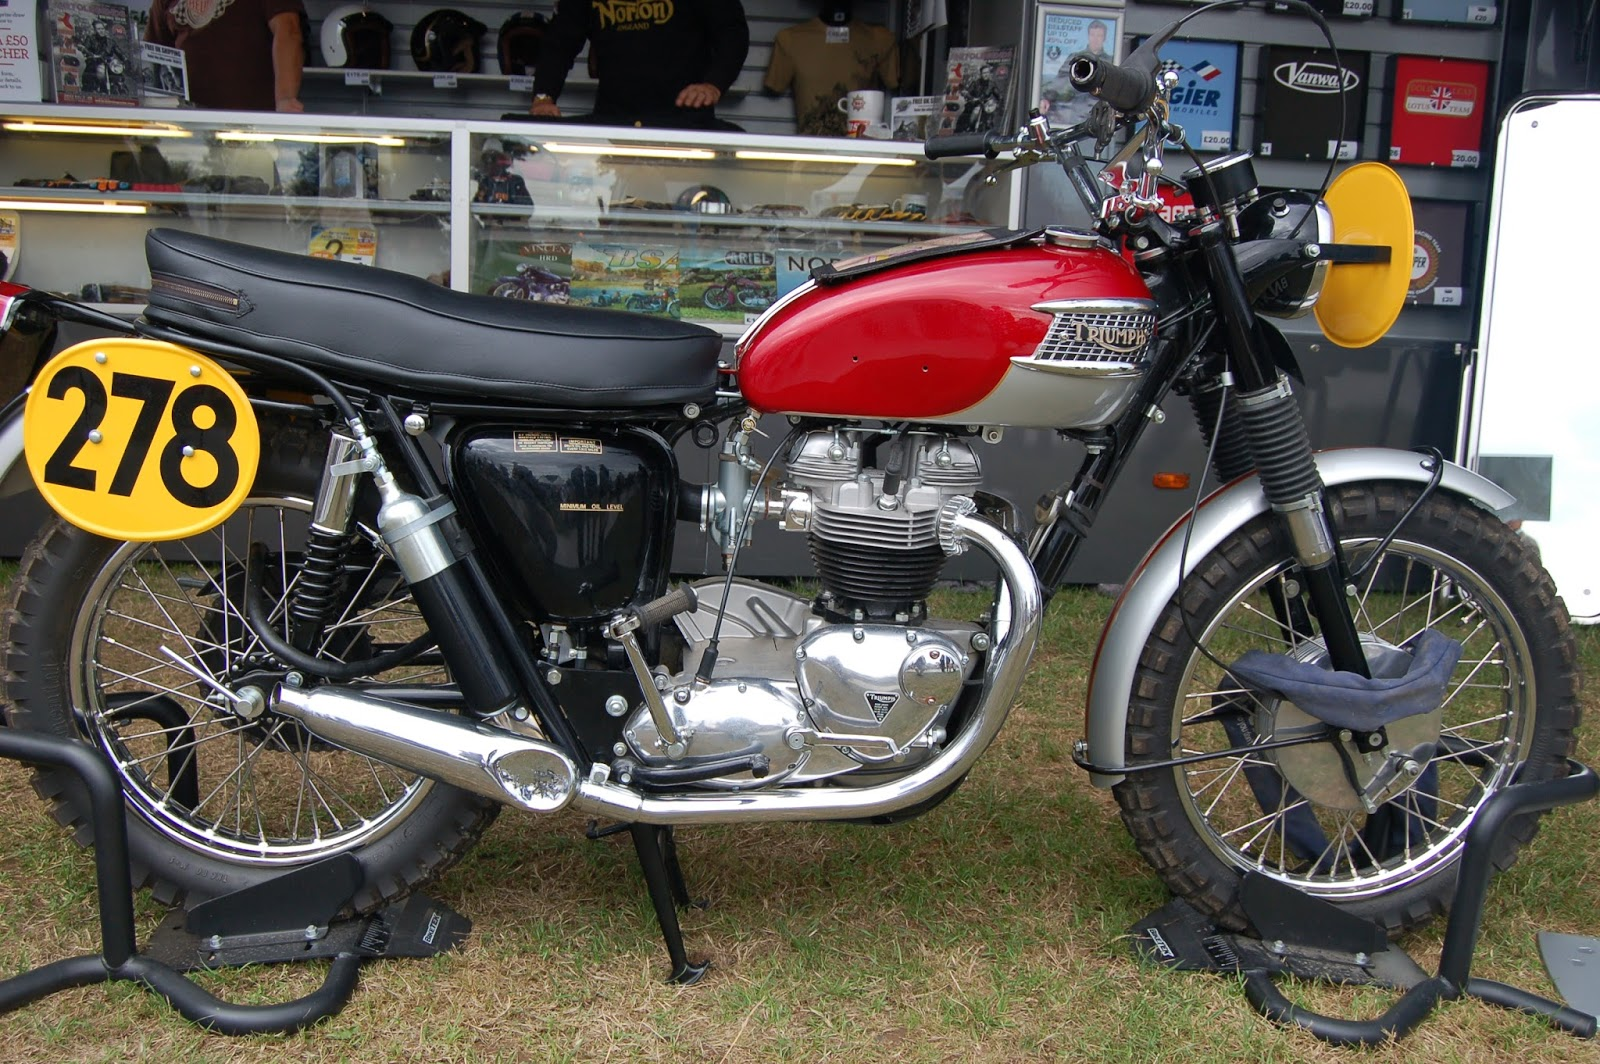 european motorcycle diaries steve mcqueen triumph isdt bike. Black Bedroom Furniture Sets. Home Design Ideas